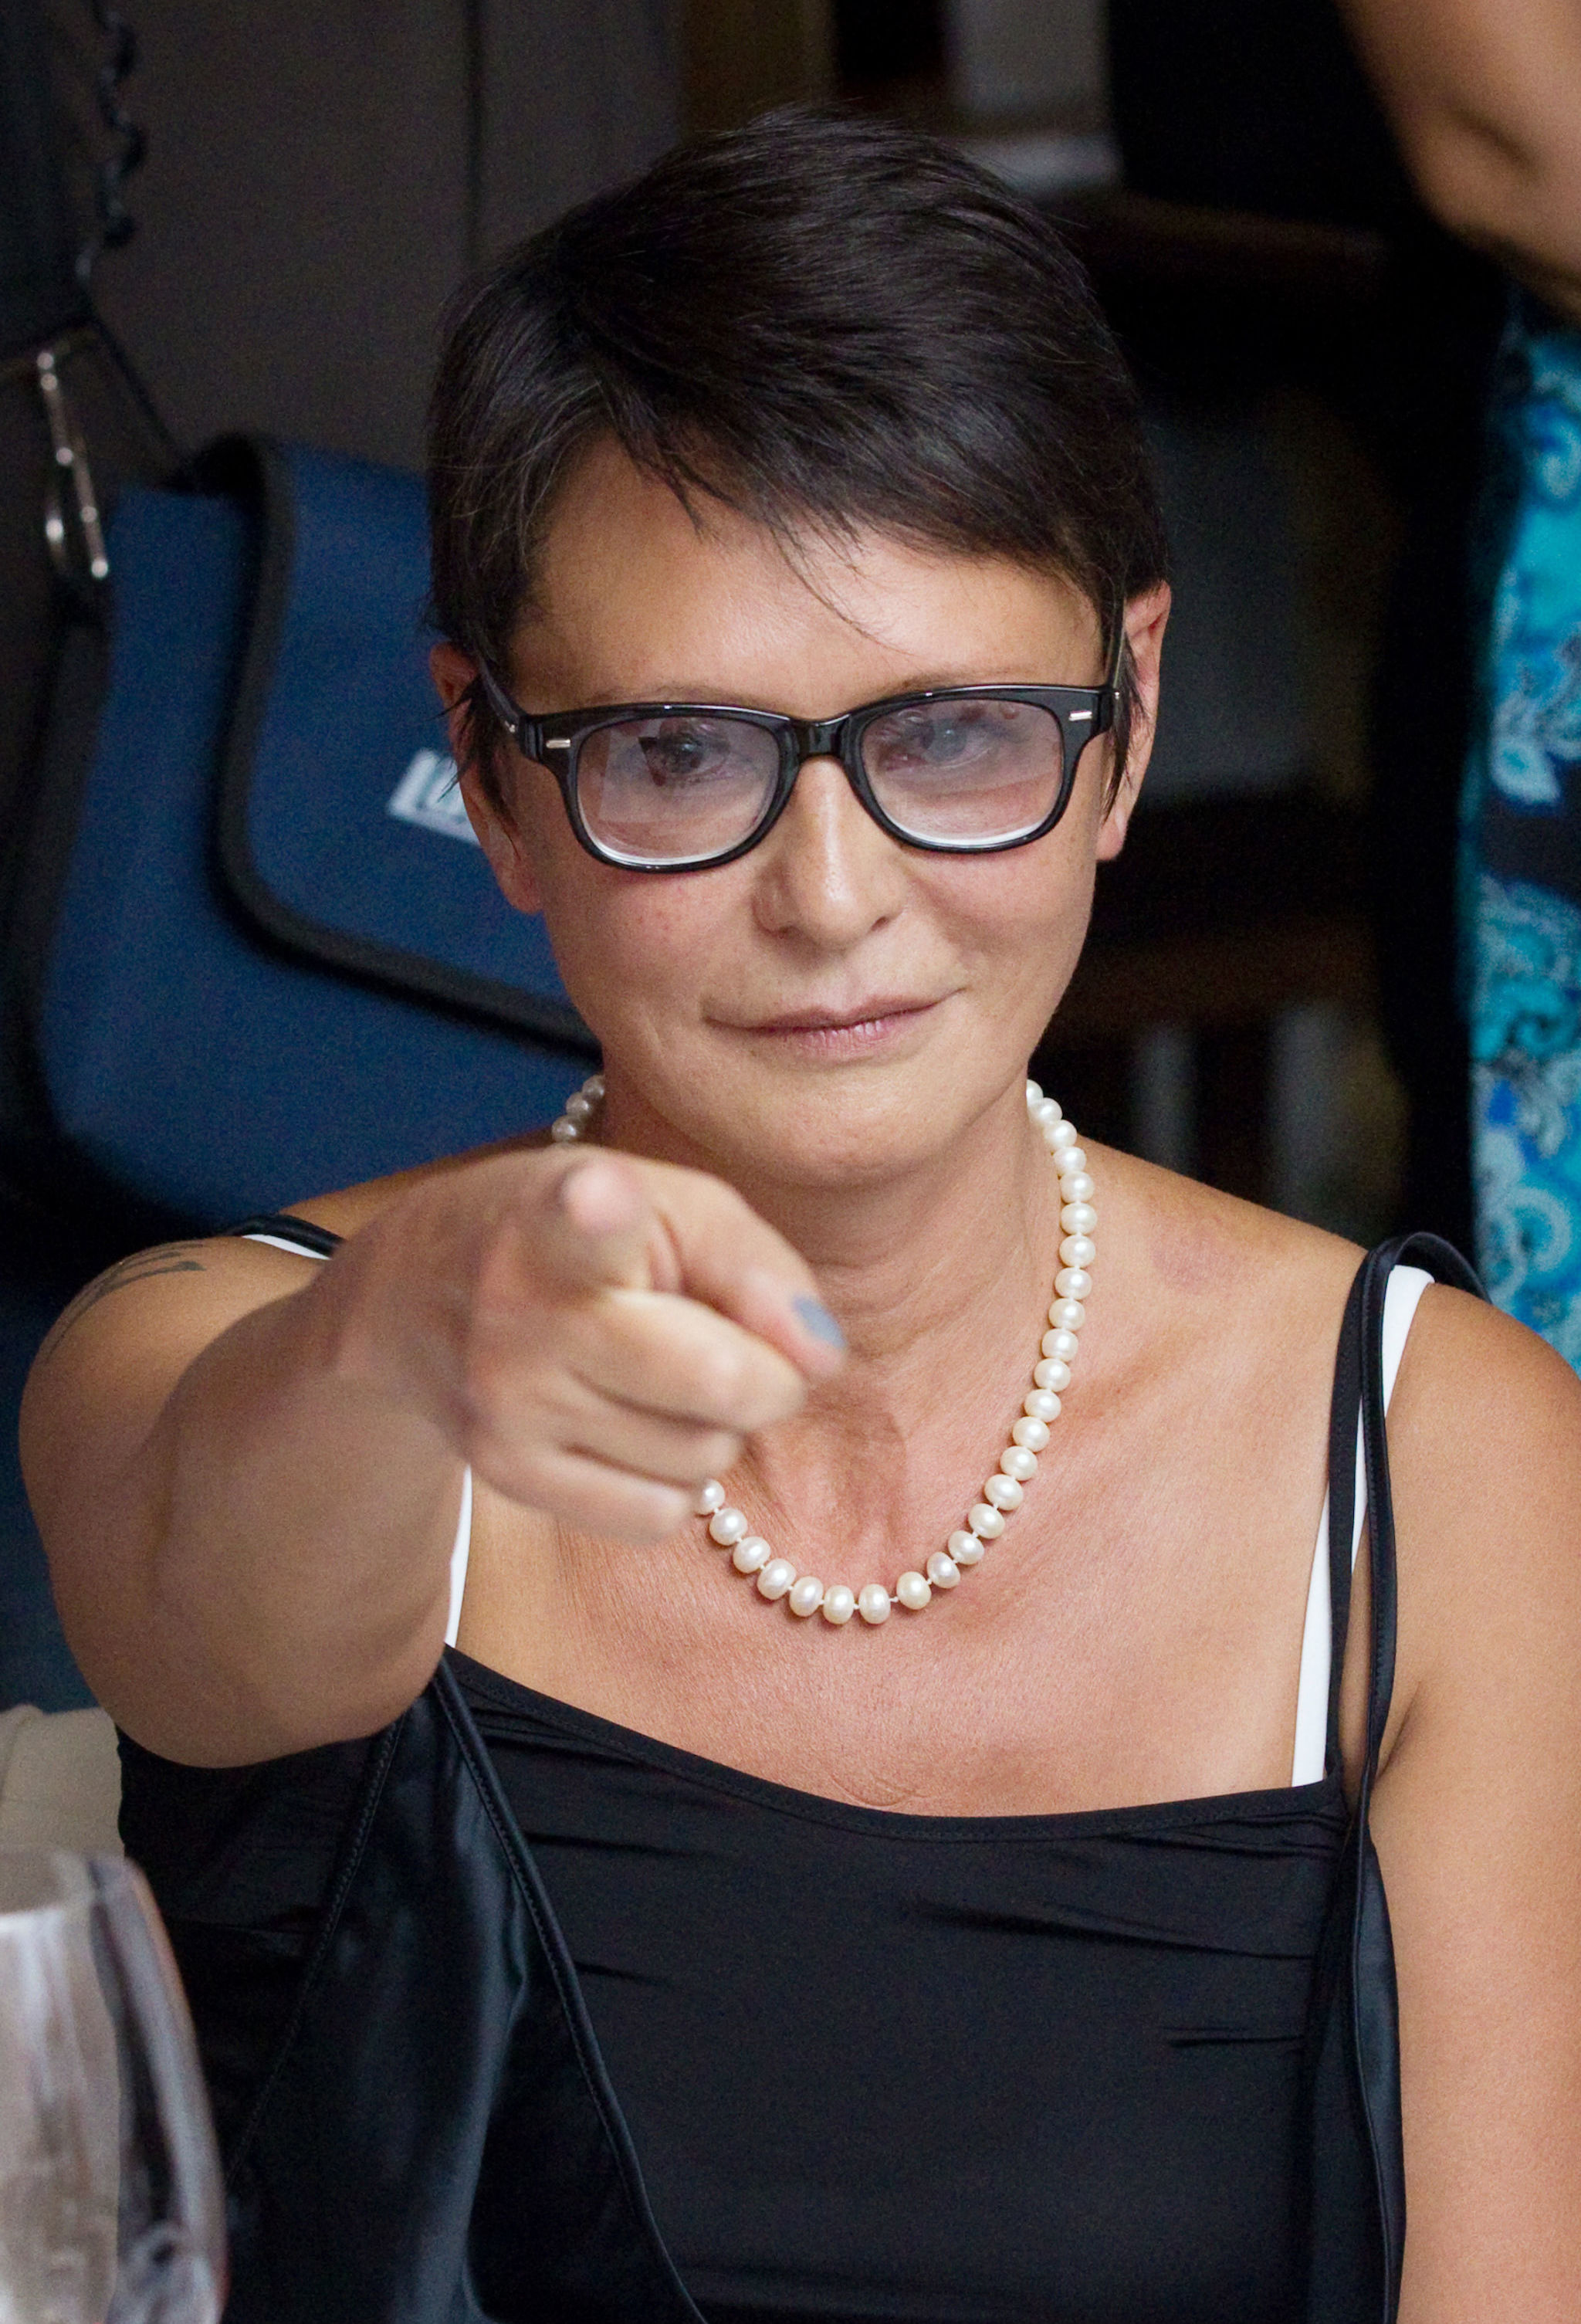 Ирина хакамада - биография, фото, личная жизнь, политика, новости 2020 - 24сми